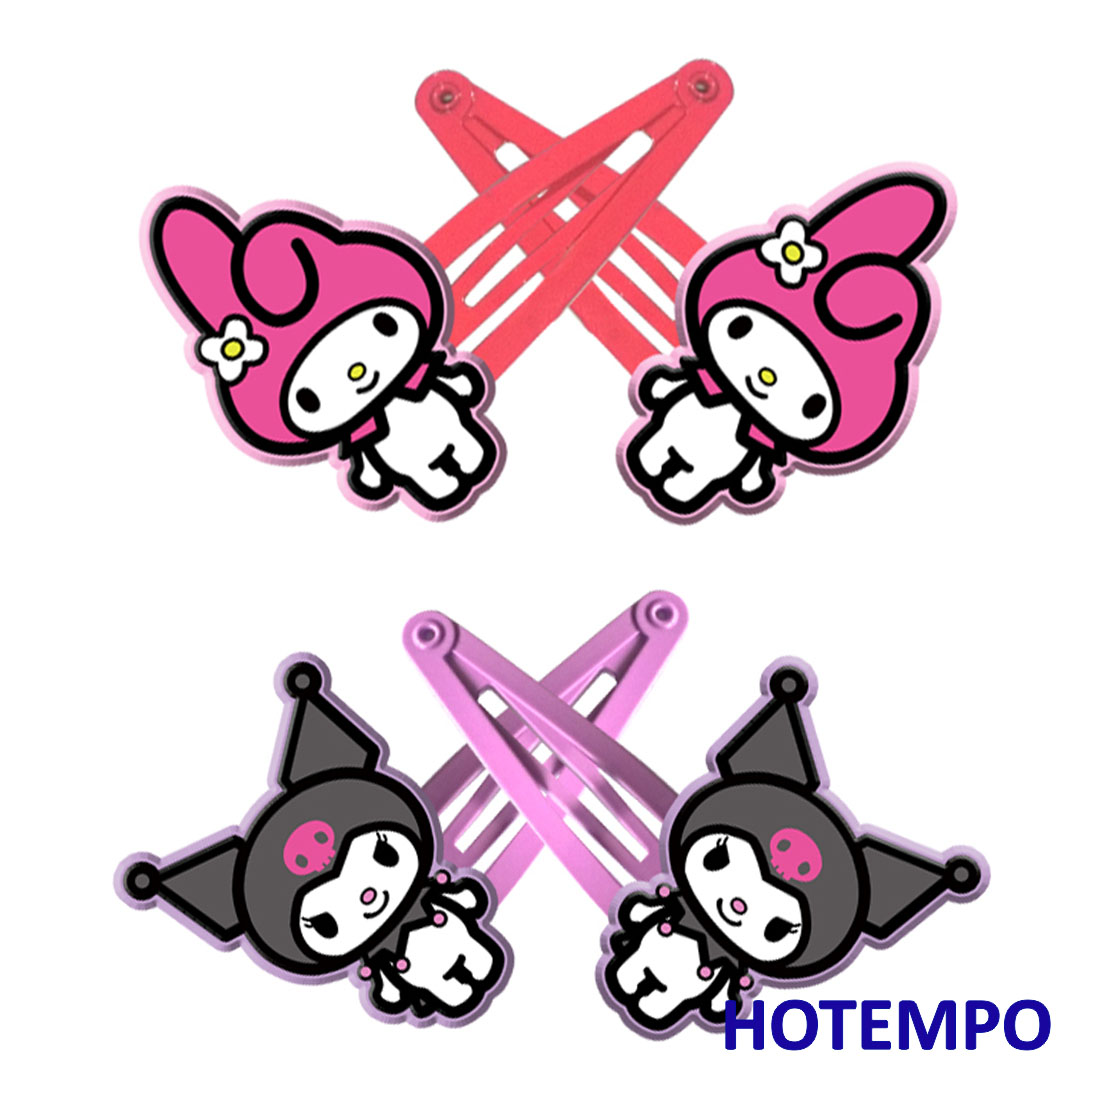 Japan Kawaii Cute Cartoon Melody Kuromi Childhood Baby Girl Hair Accessories Hairpins Elastic HairBands Hair Clip For Kids Gift